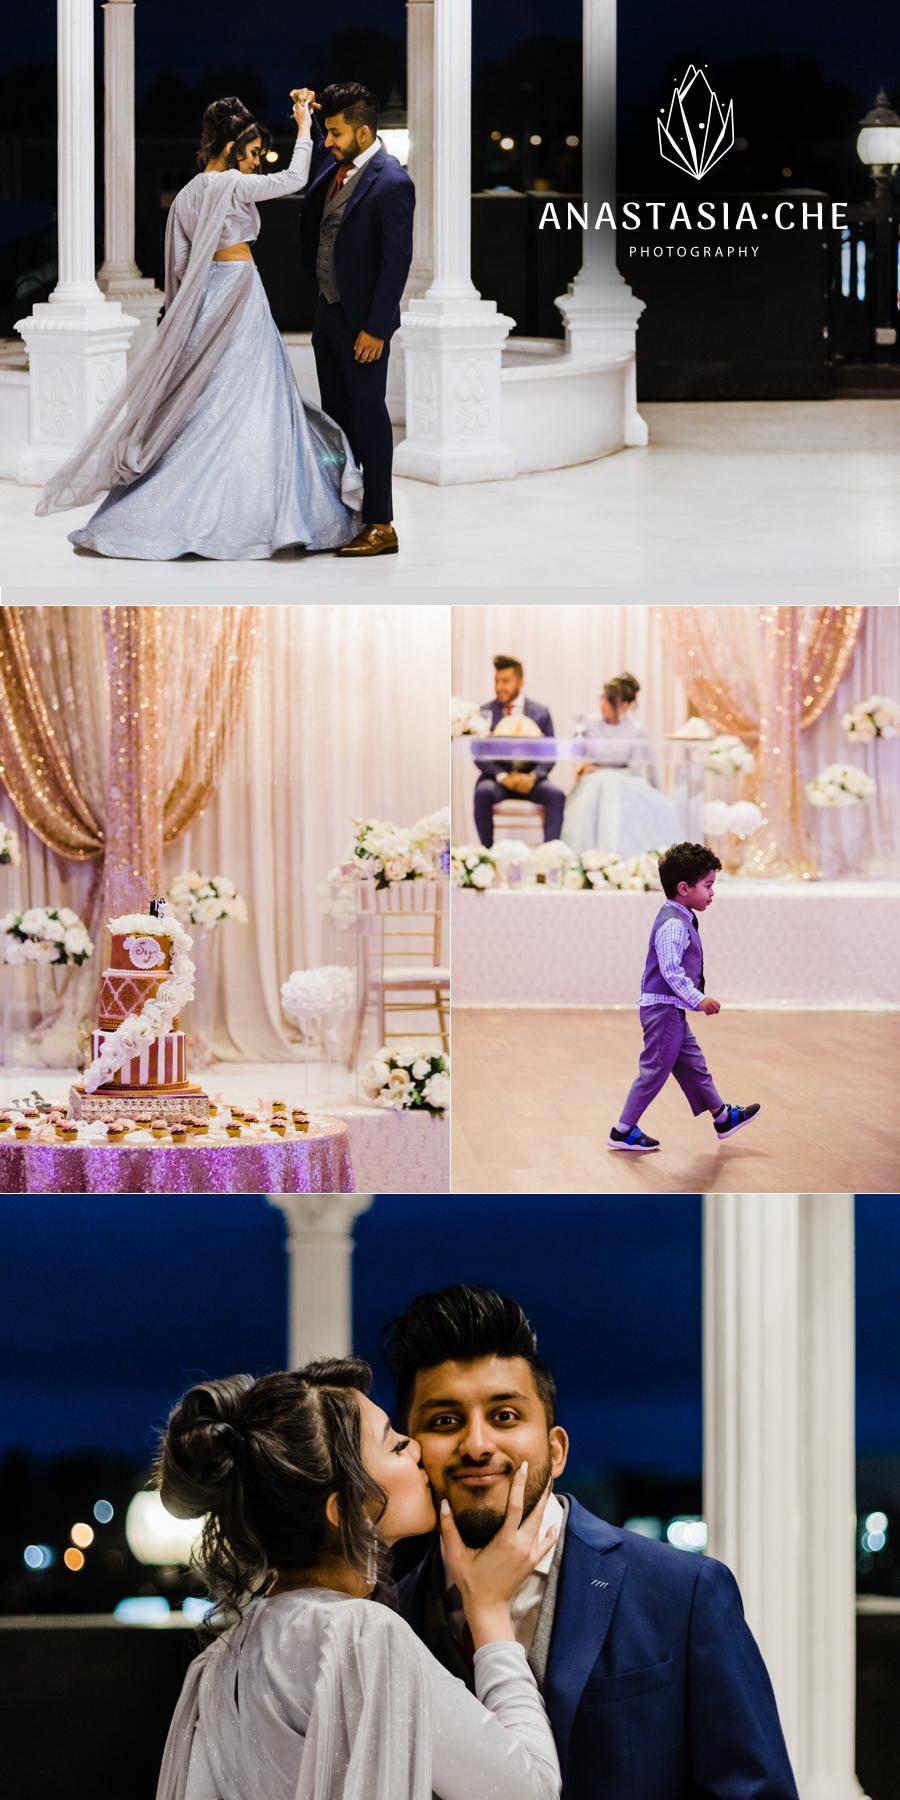 Indian wedding reception photos in Vancouver, BC